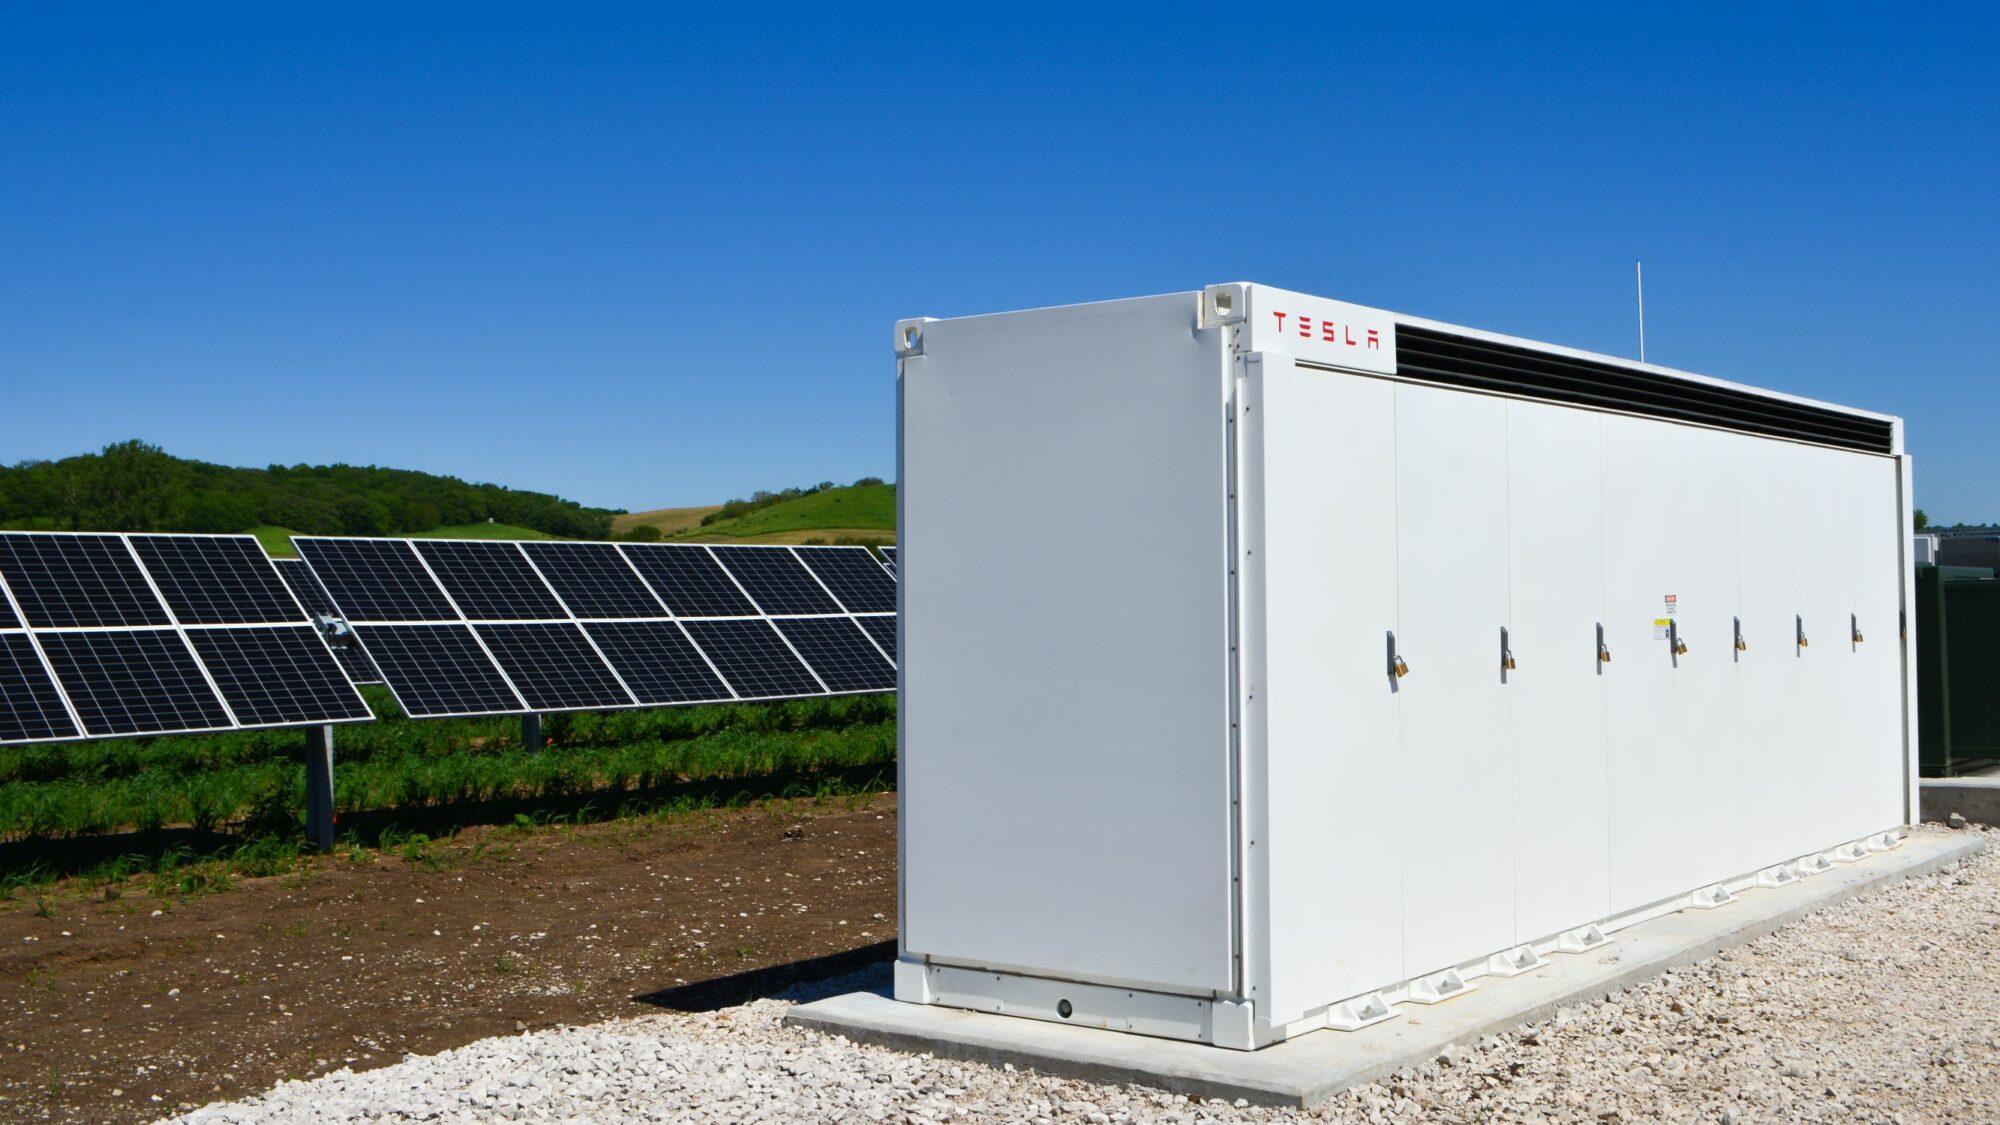 Burt County Solar-Plus-Storage Project Fully Operational